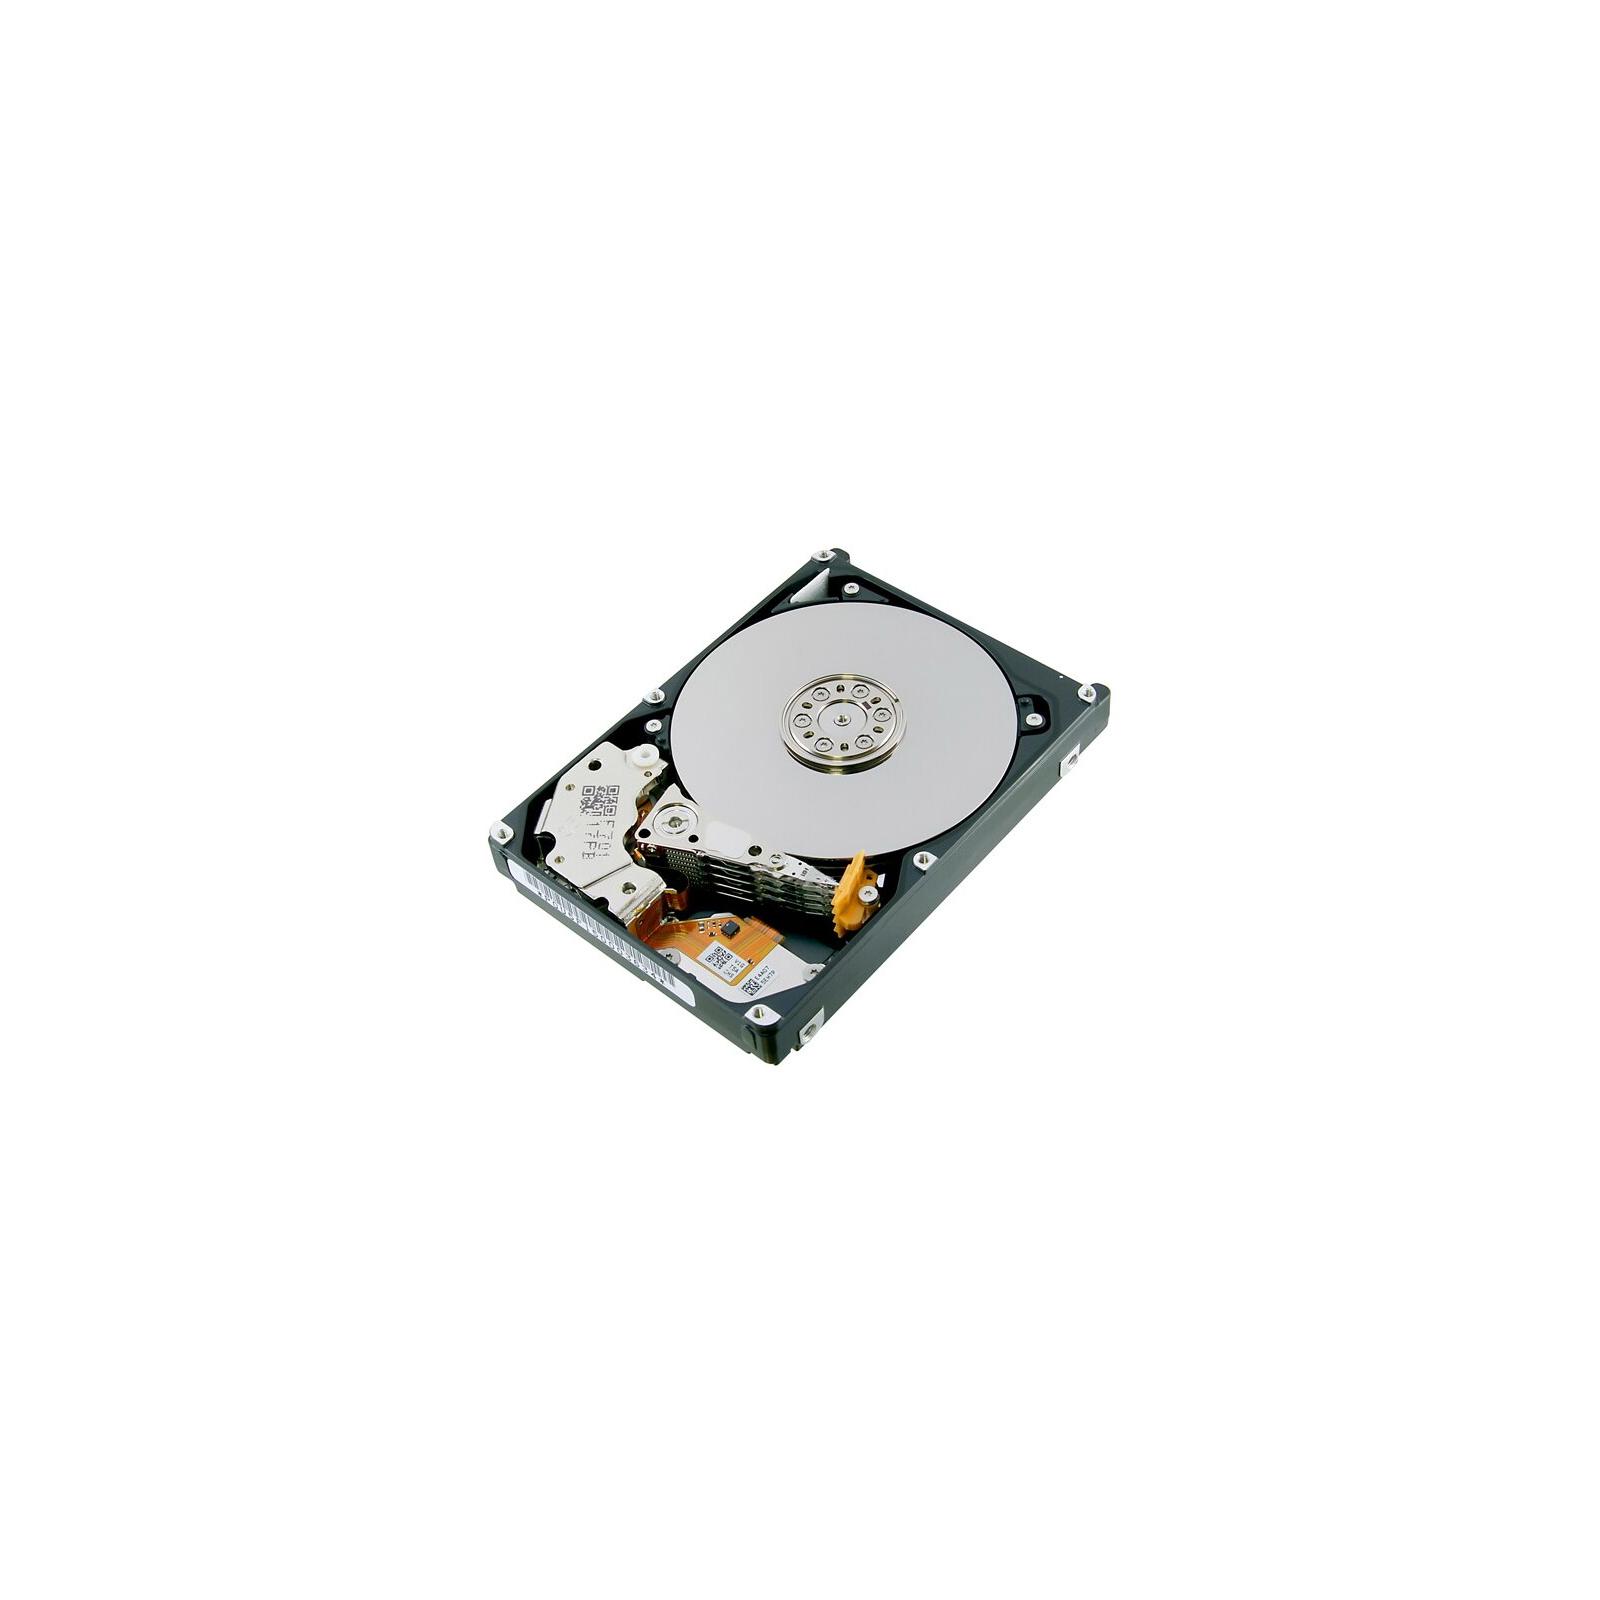 "Жесткий диск для сервера 2.5"" 600GB SAS 128MB 10500rpm Toshiba (AL15SEB060N) изображение 2"